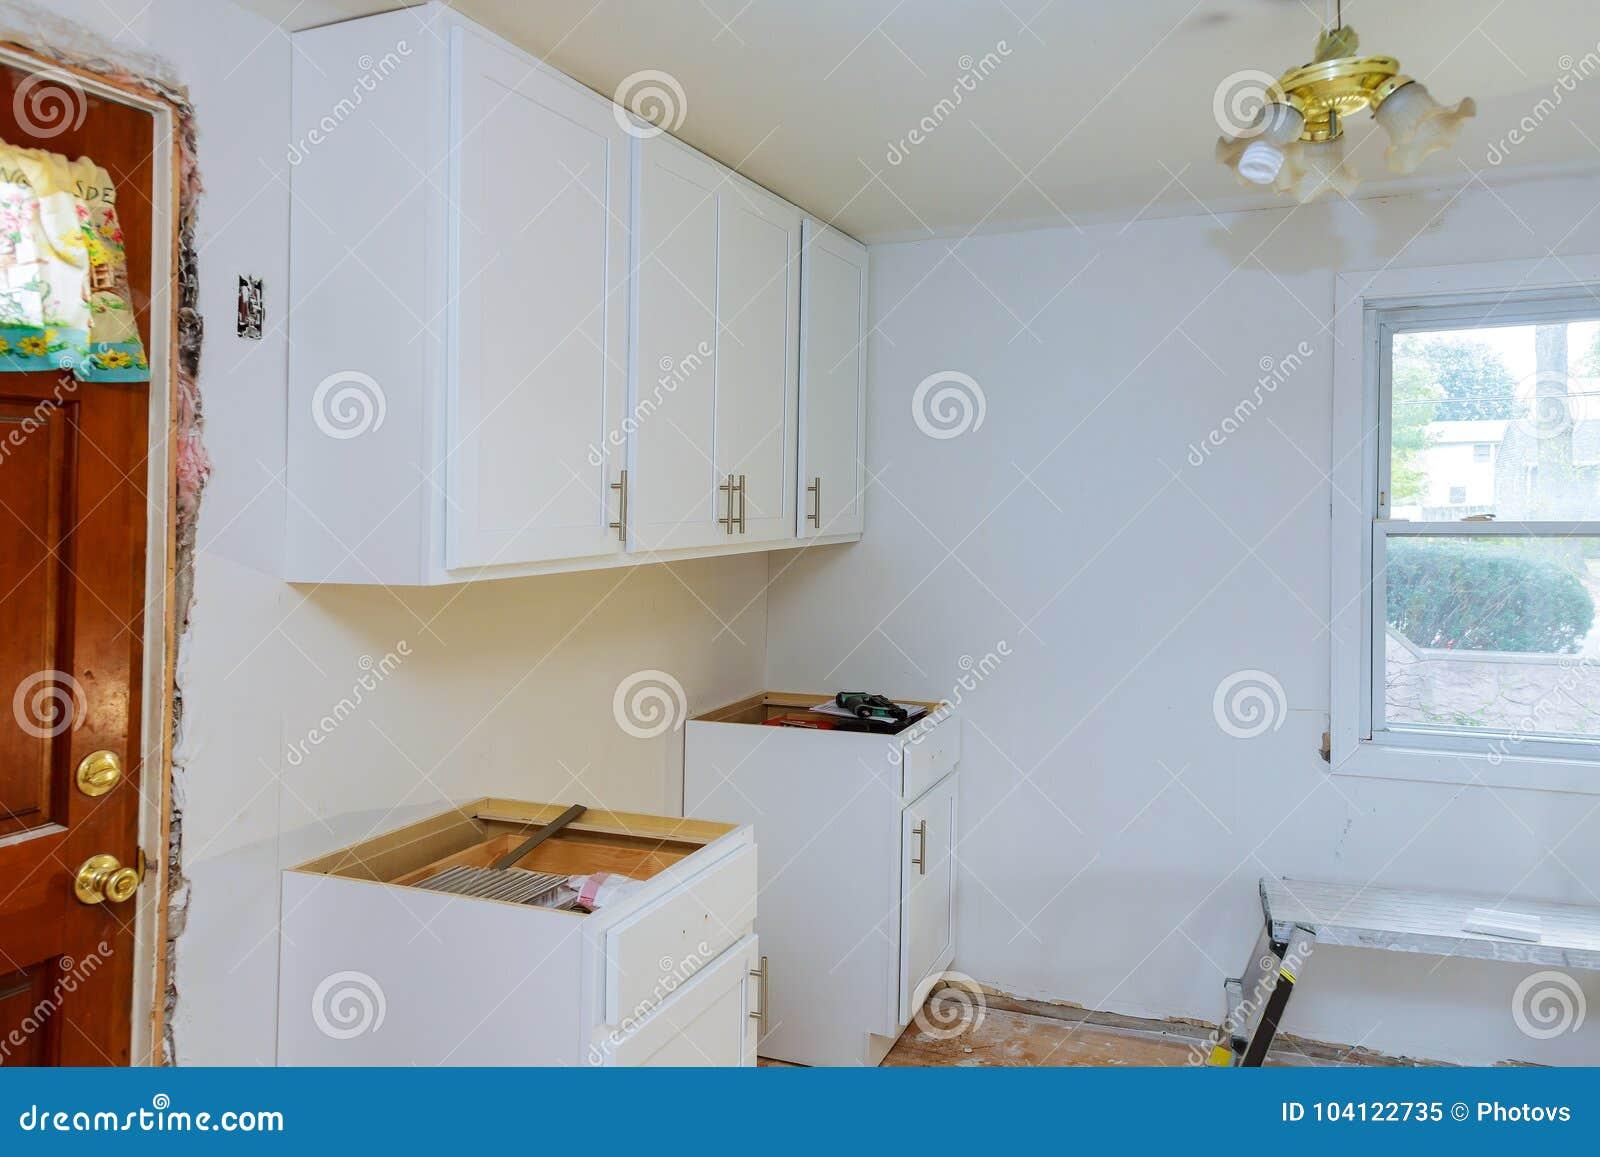 Installing New Modern Kitchen Setup Cabinate Kitchen Stock Image